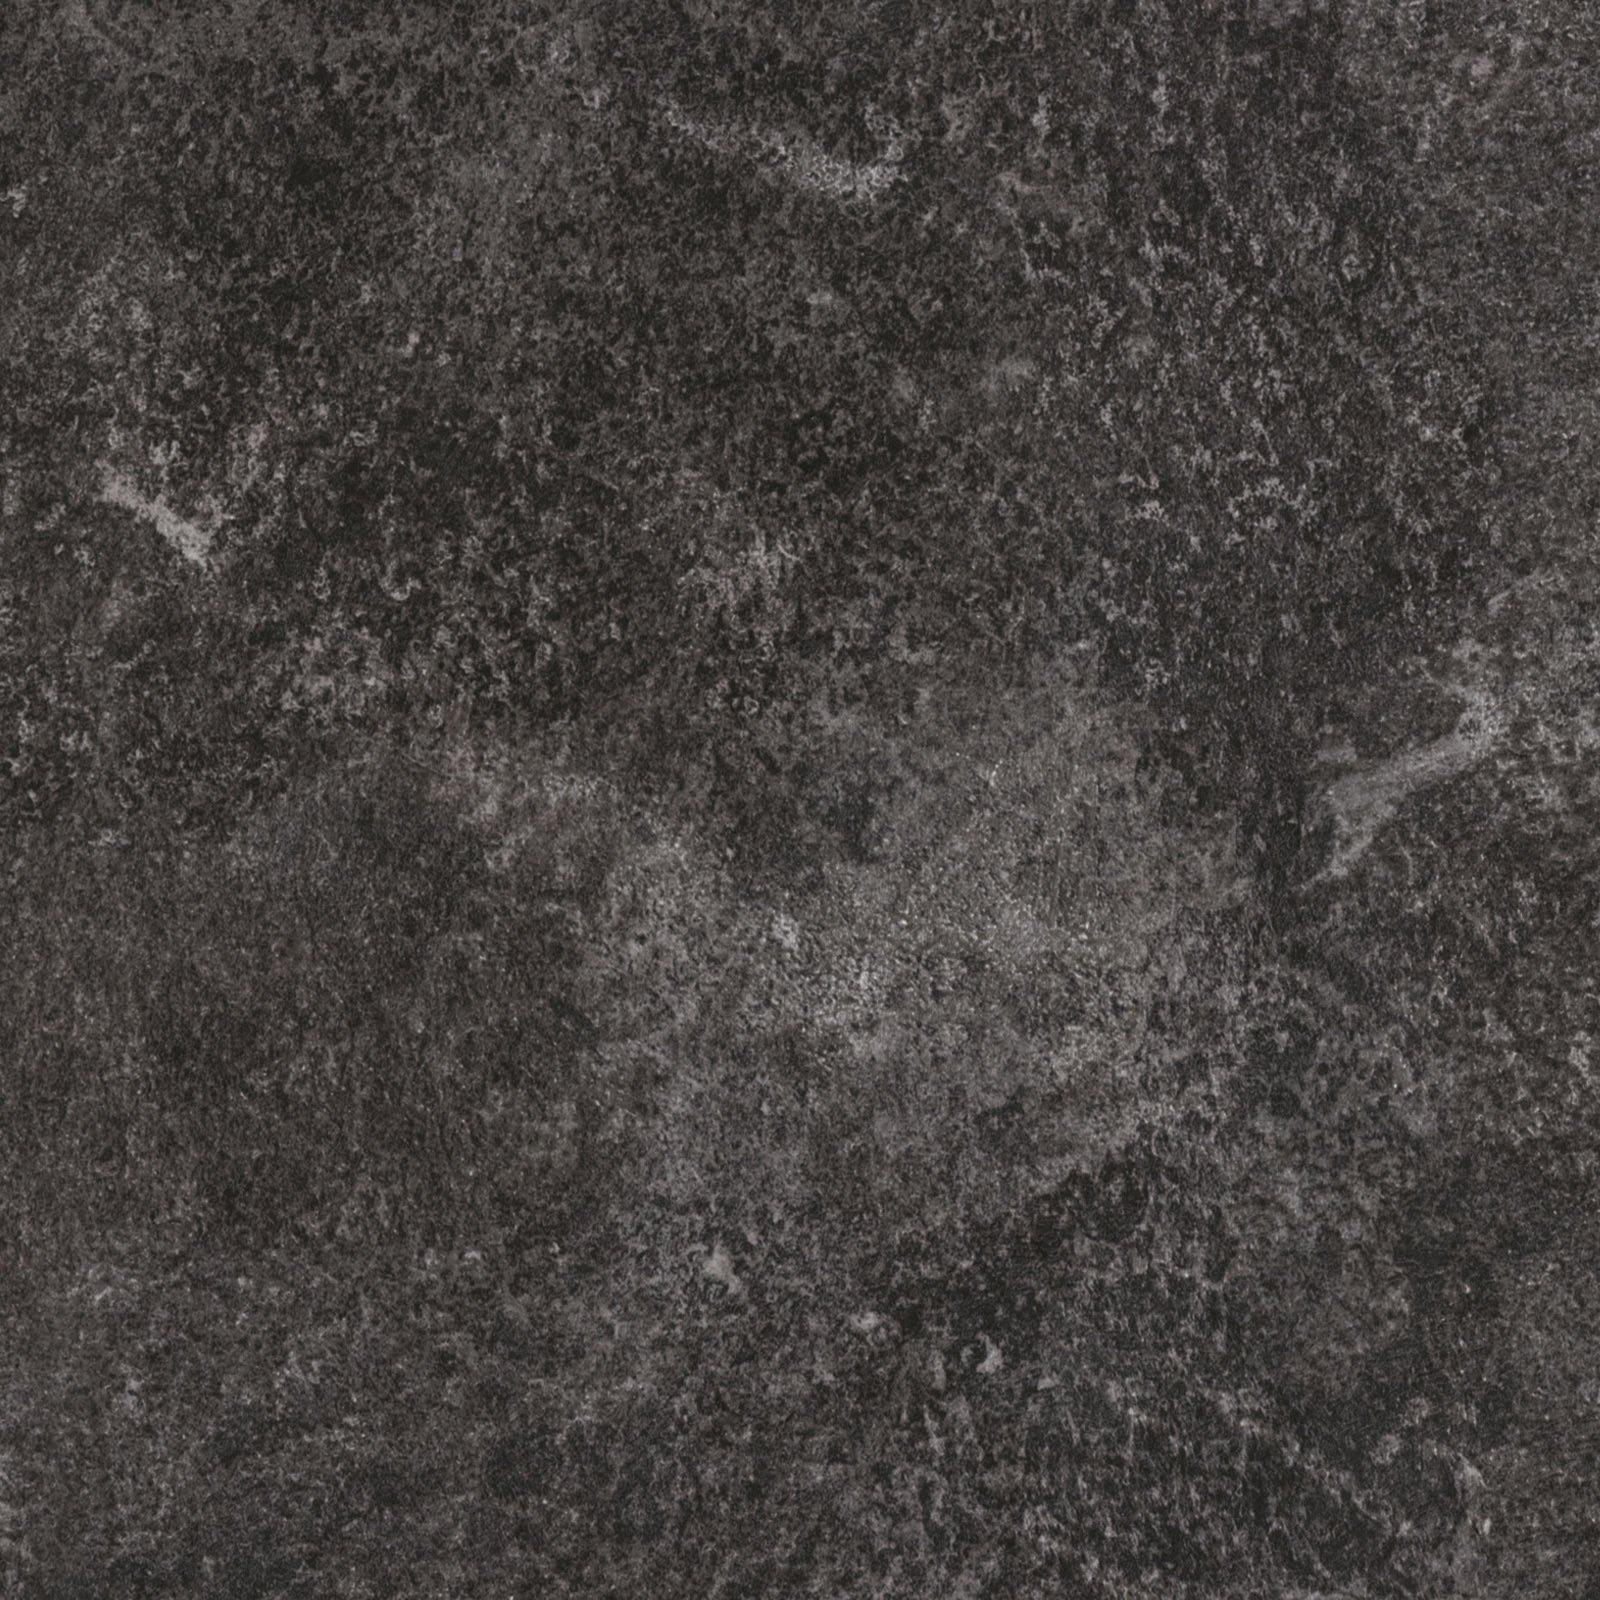 D c fix klebefolie avellino beton grau 45x200 cm for Klebefolie grau matt